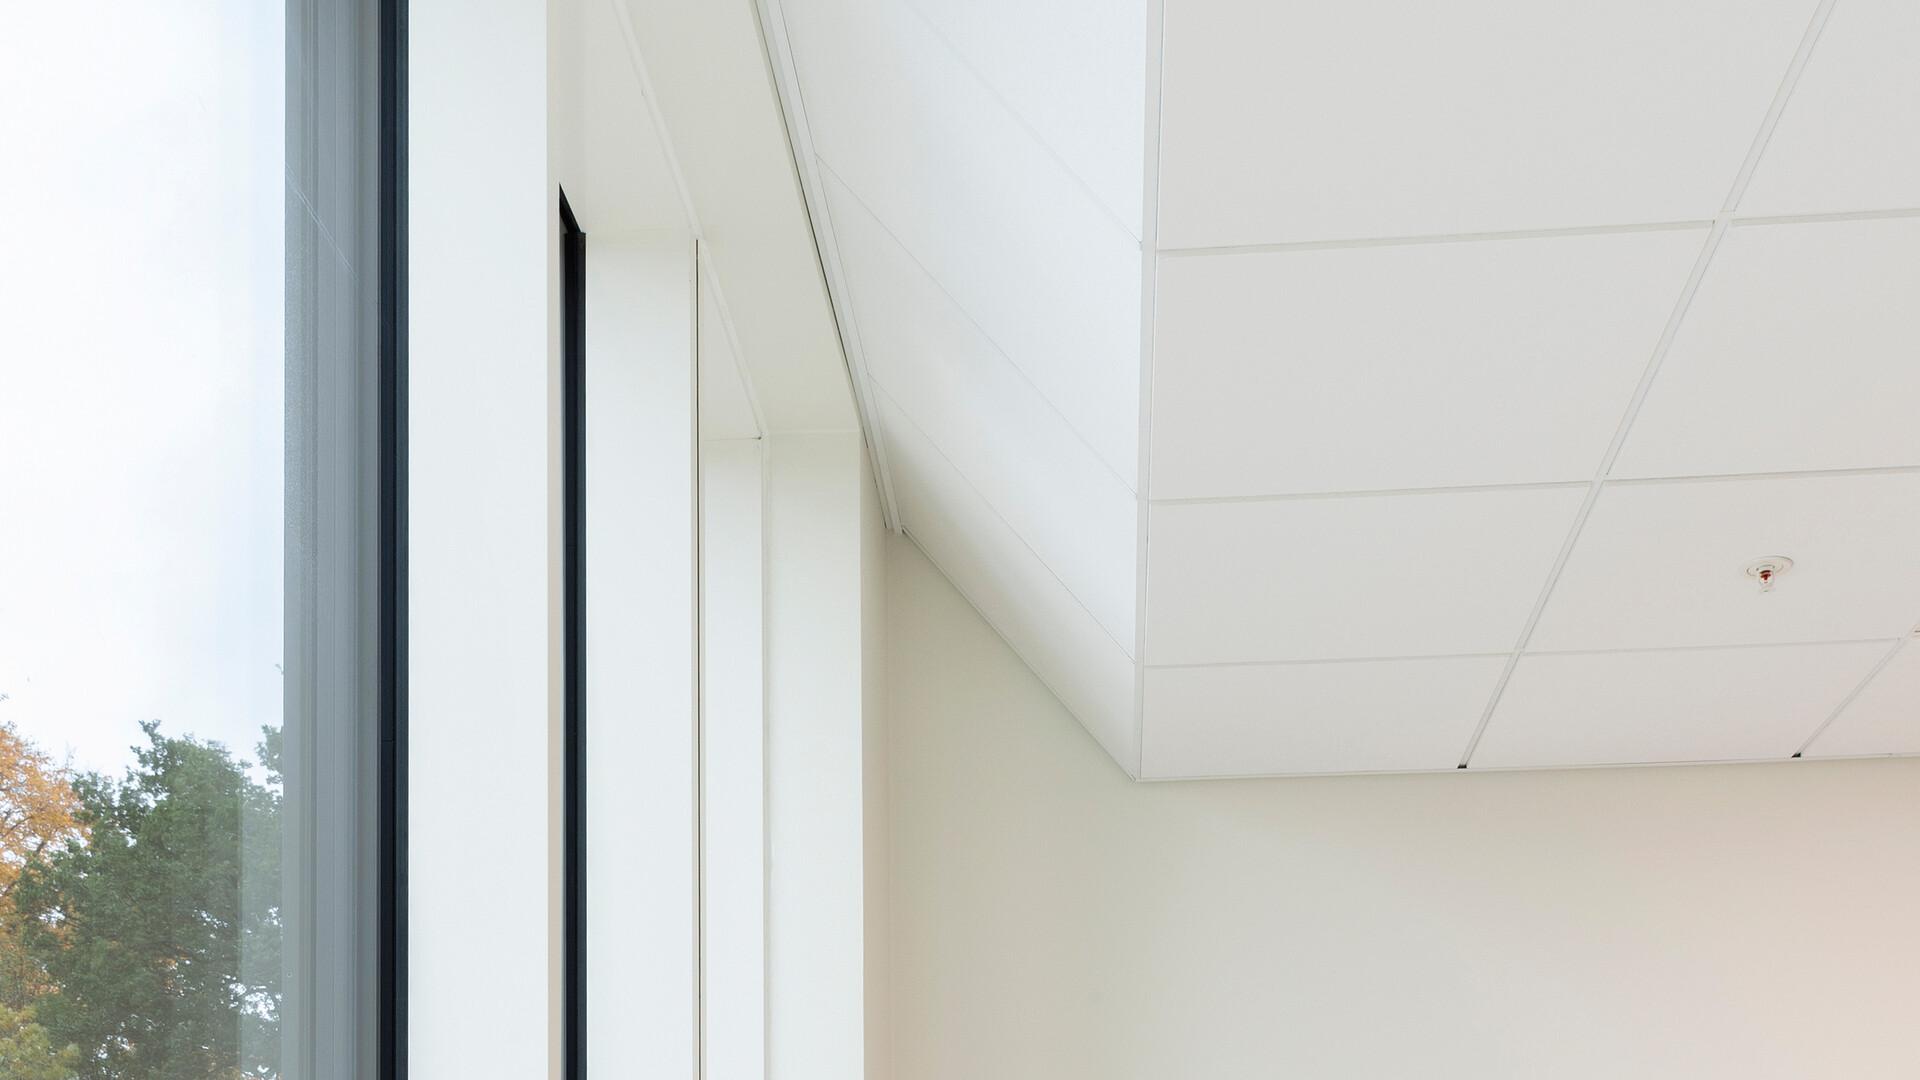 Akustikloft: Rockfon Blanka®, E15, 600 x 600